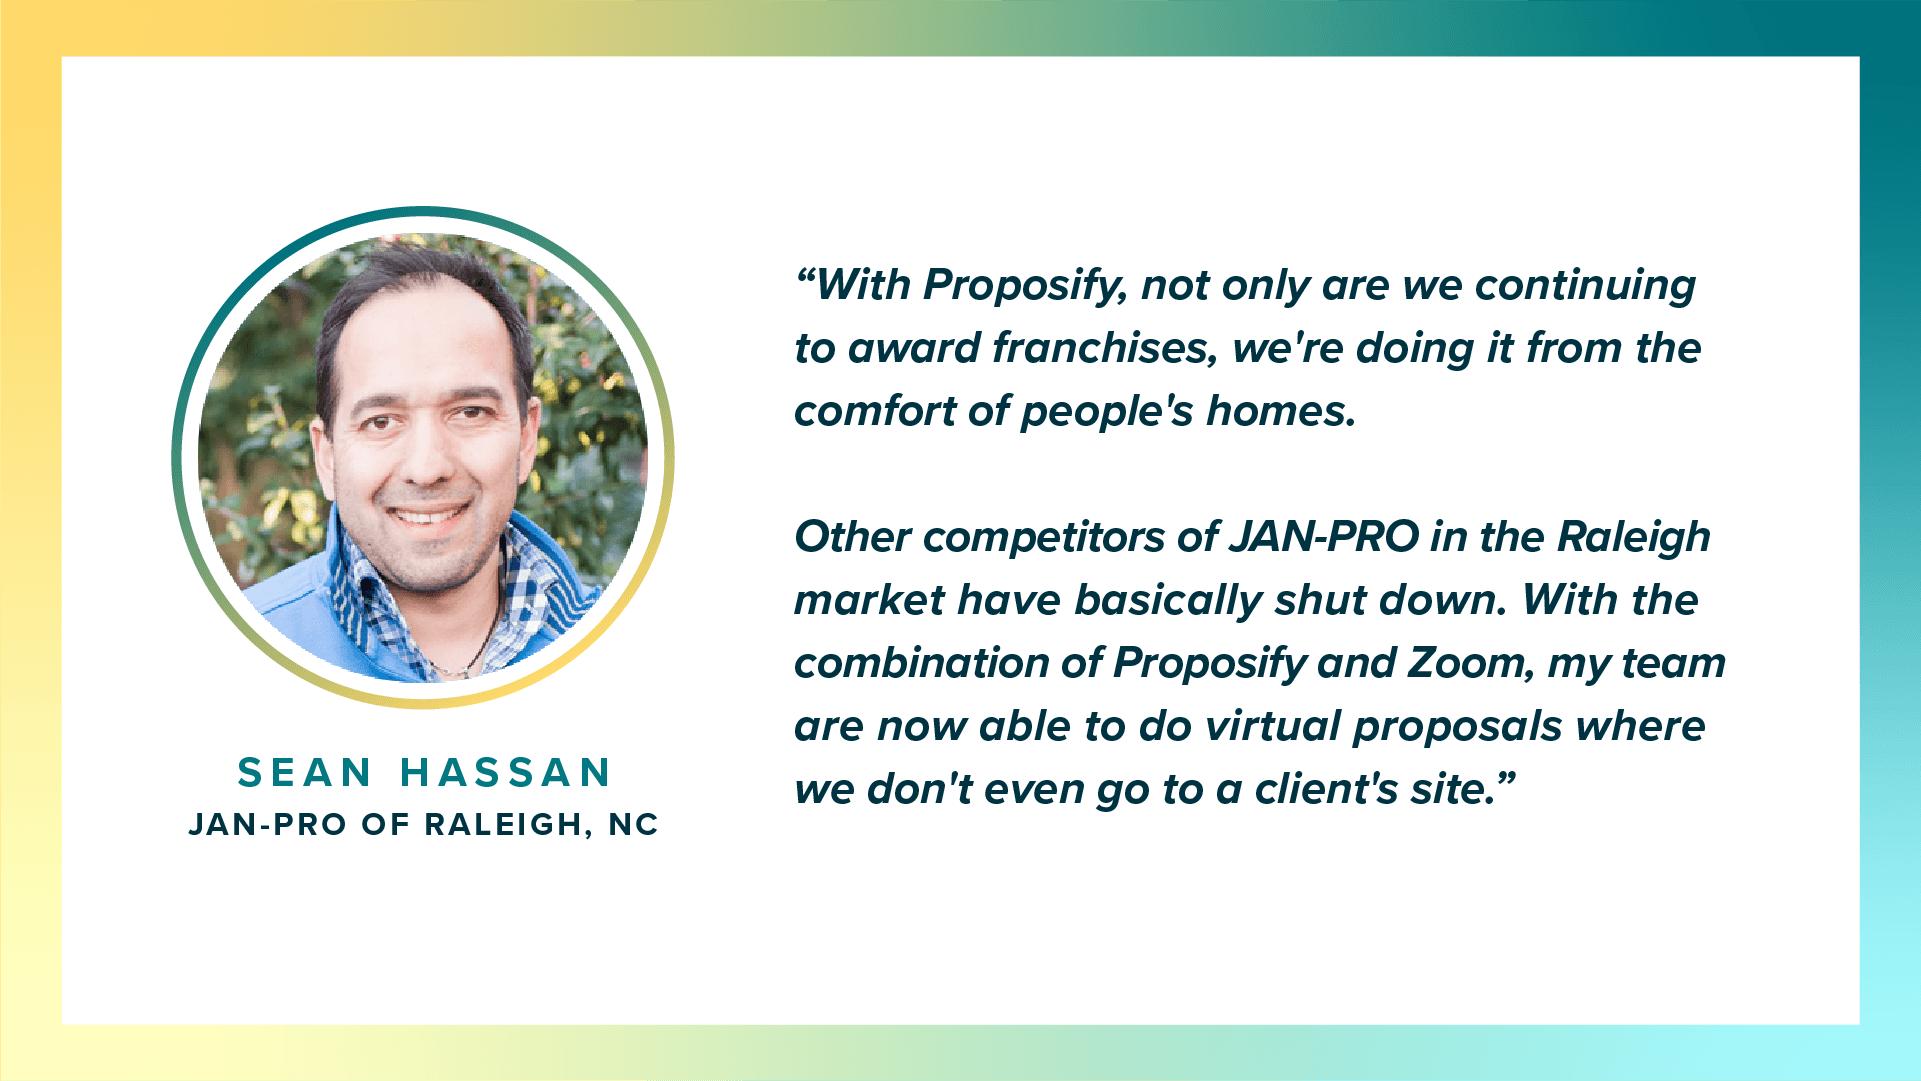 Sean Hassan, Jan-Pro's testimonial for Proposify